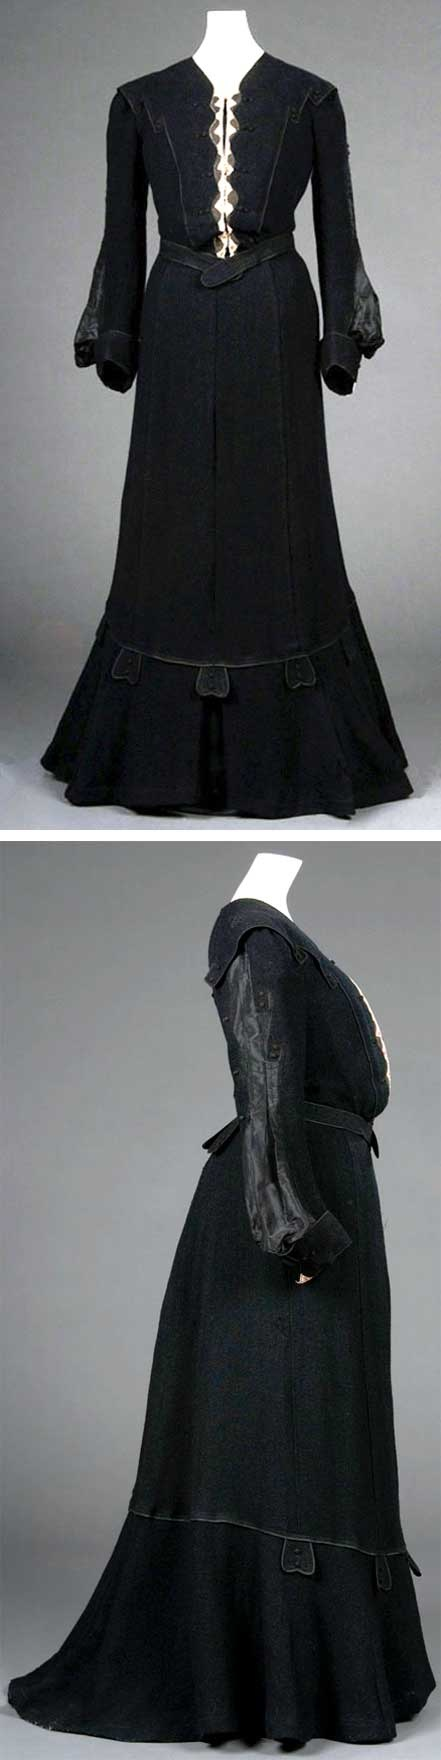 Two-piece black dress, ca. 1902-1904.  Wool and silk. FIDM Museum